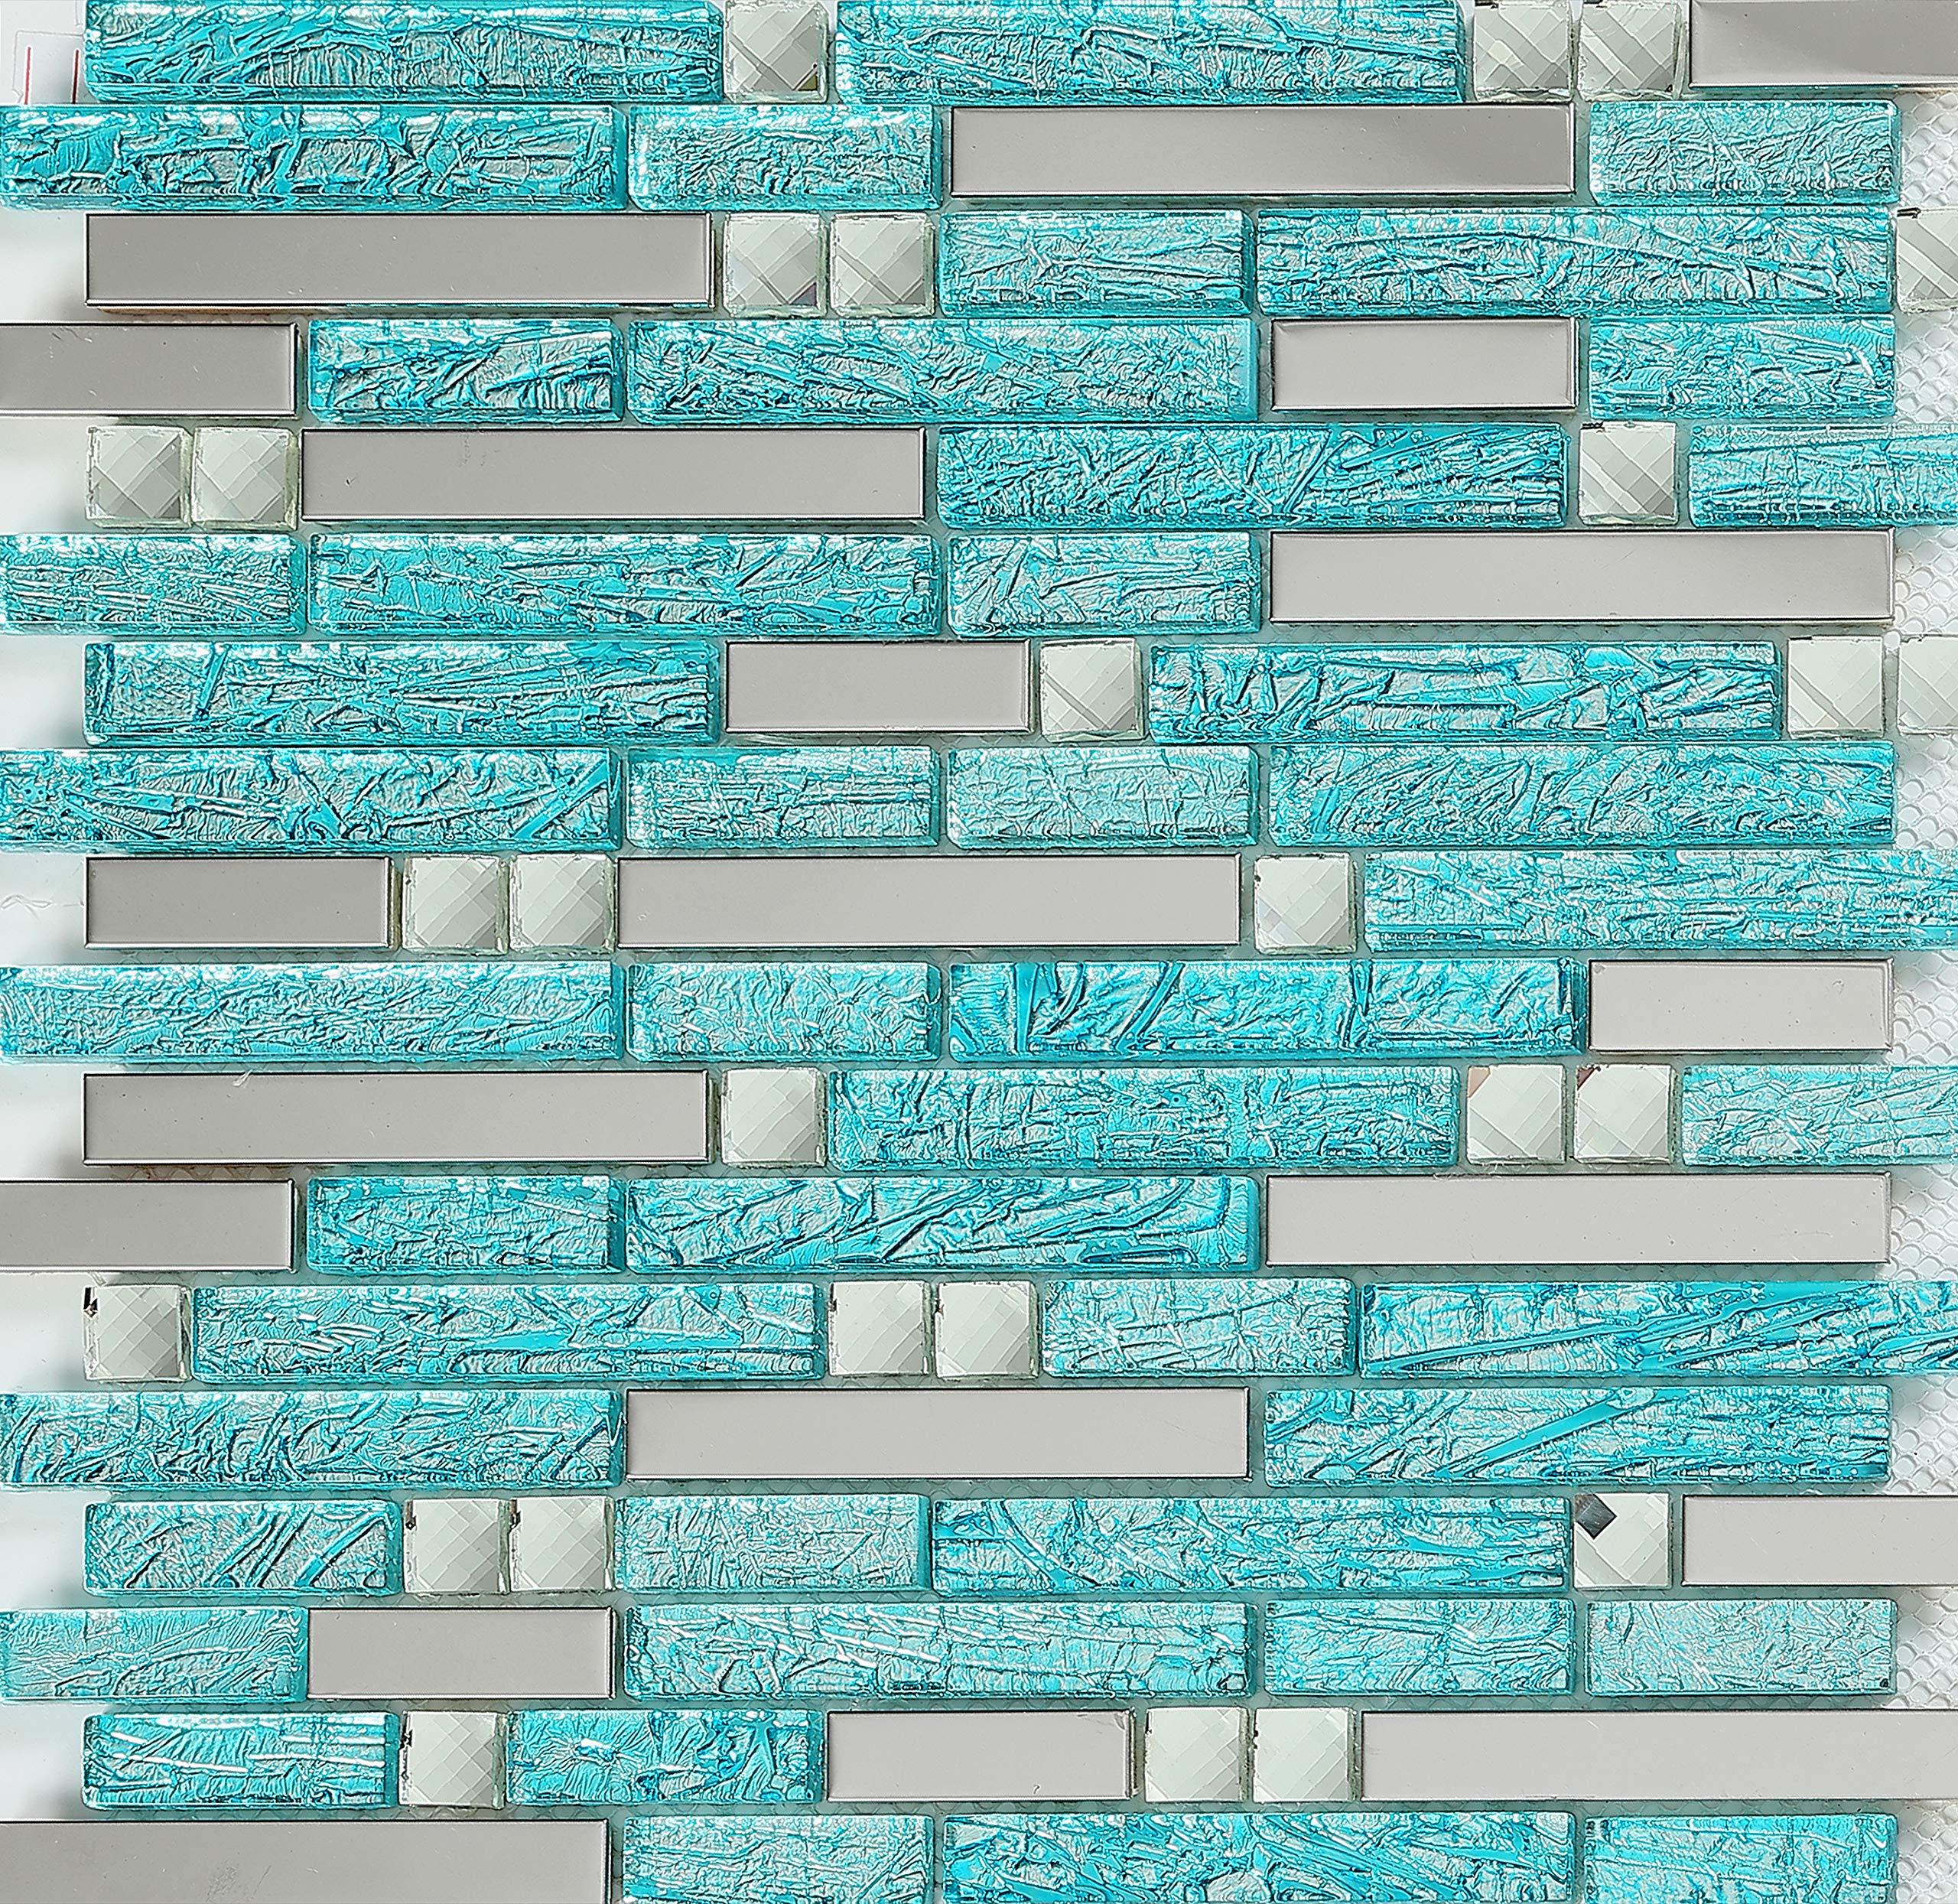 Hominter H20 Aqua Backsplash Tile for Kitchen, Bathroom, Shower and Accent Walls, Silver Stainless Steel & Glass Rhinestone Mosaic, Mirrored Metal Wall Back Splash Interlocking Pattern Cover 11 Sq Ft